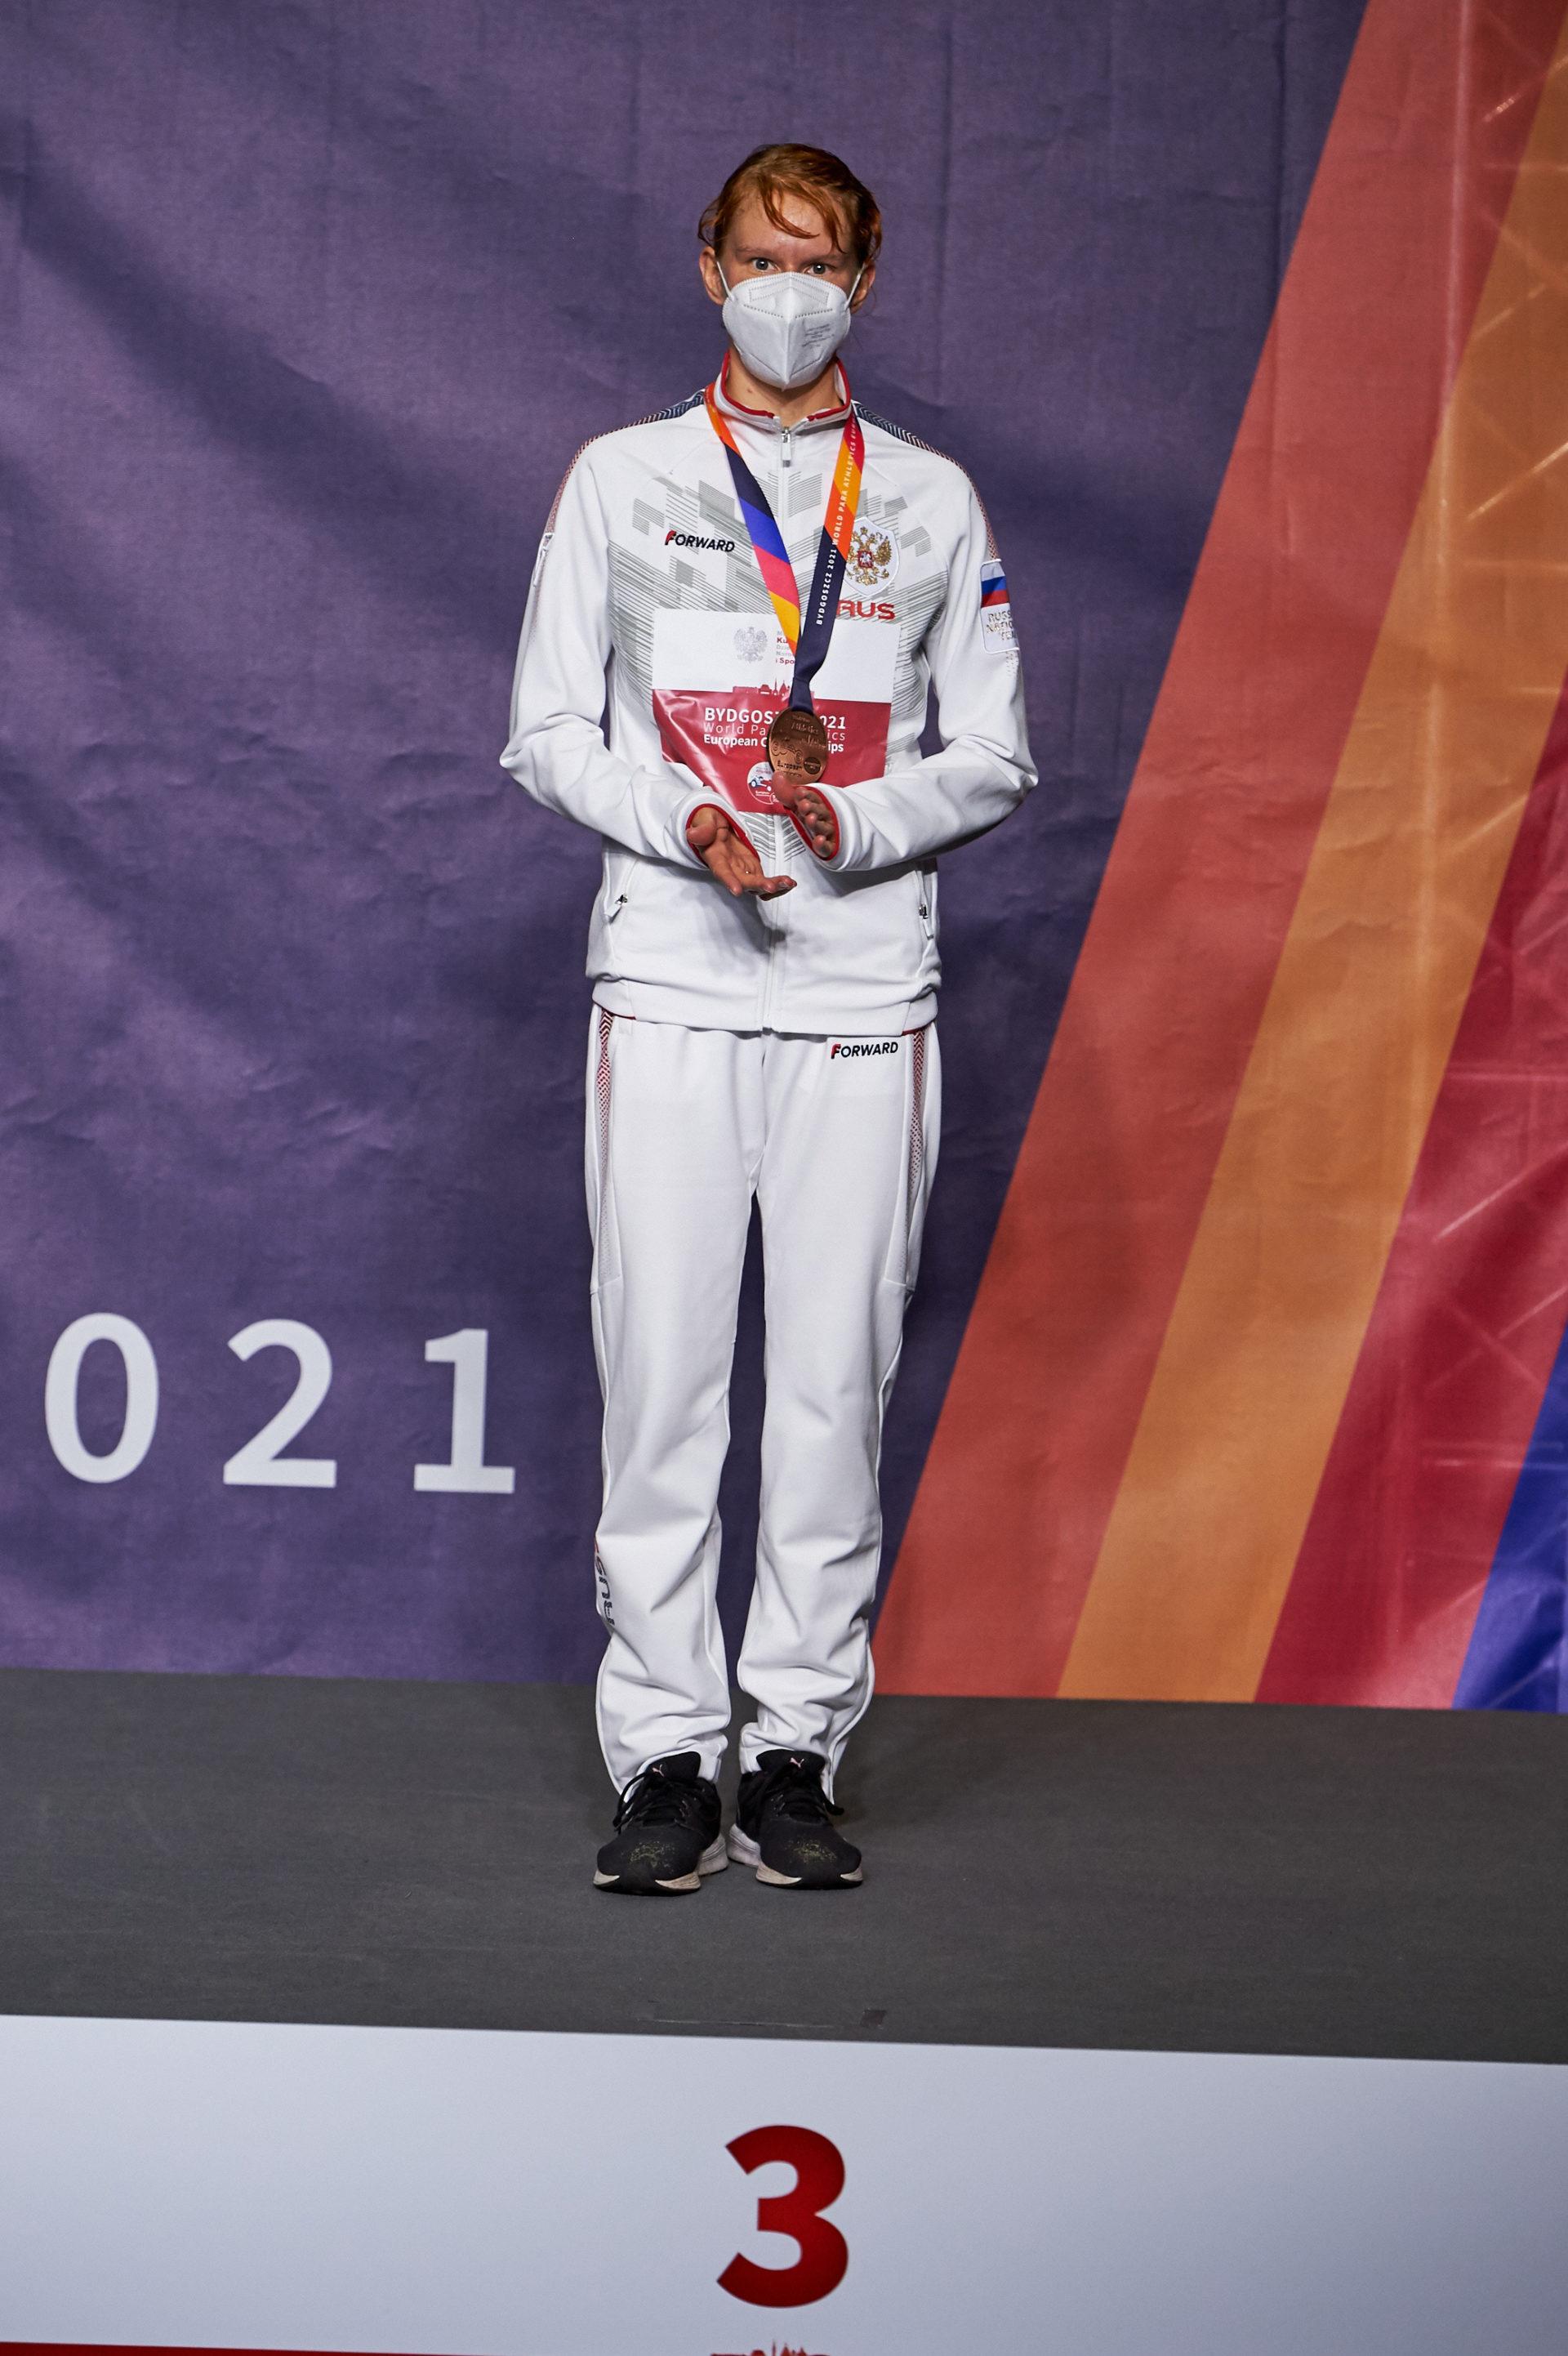 2021-06-01-world-para-athletics-european-championships-bydgoszcz-2021-adrian-stykowski